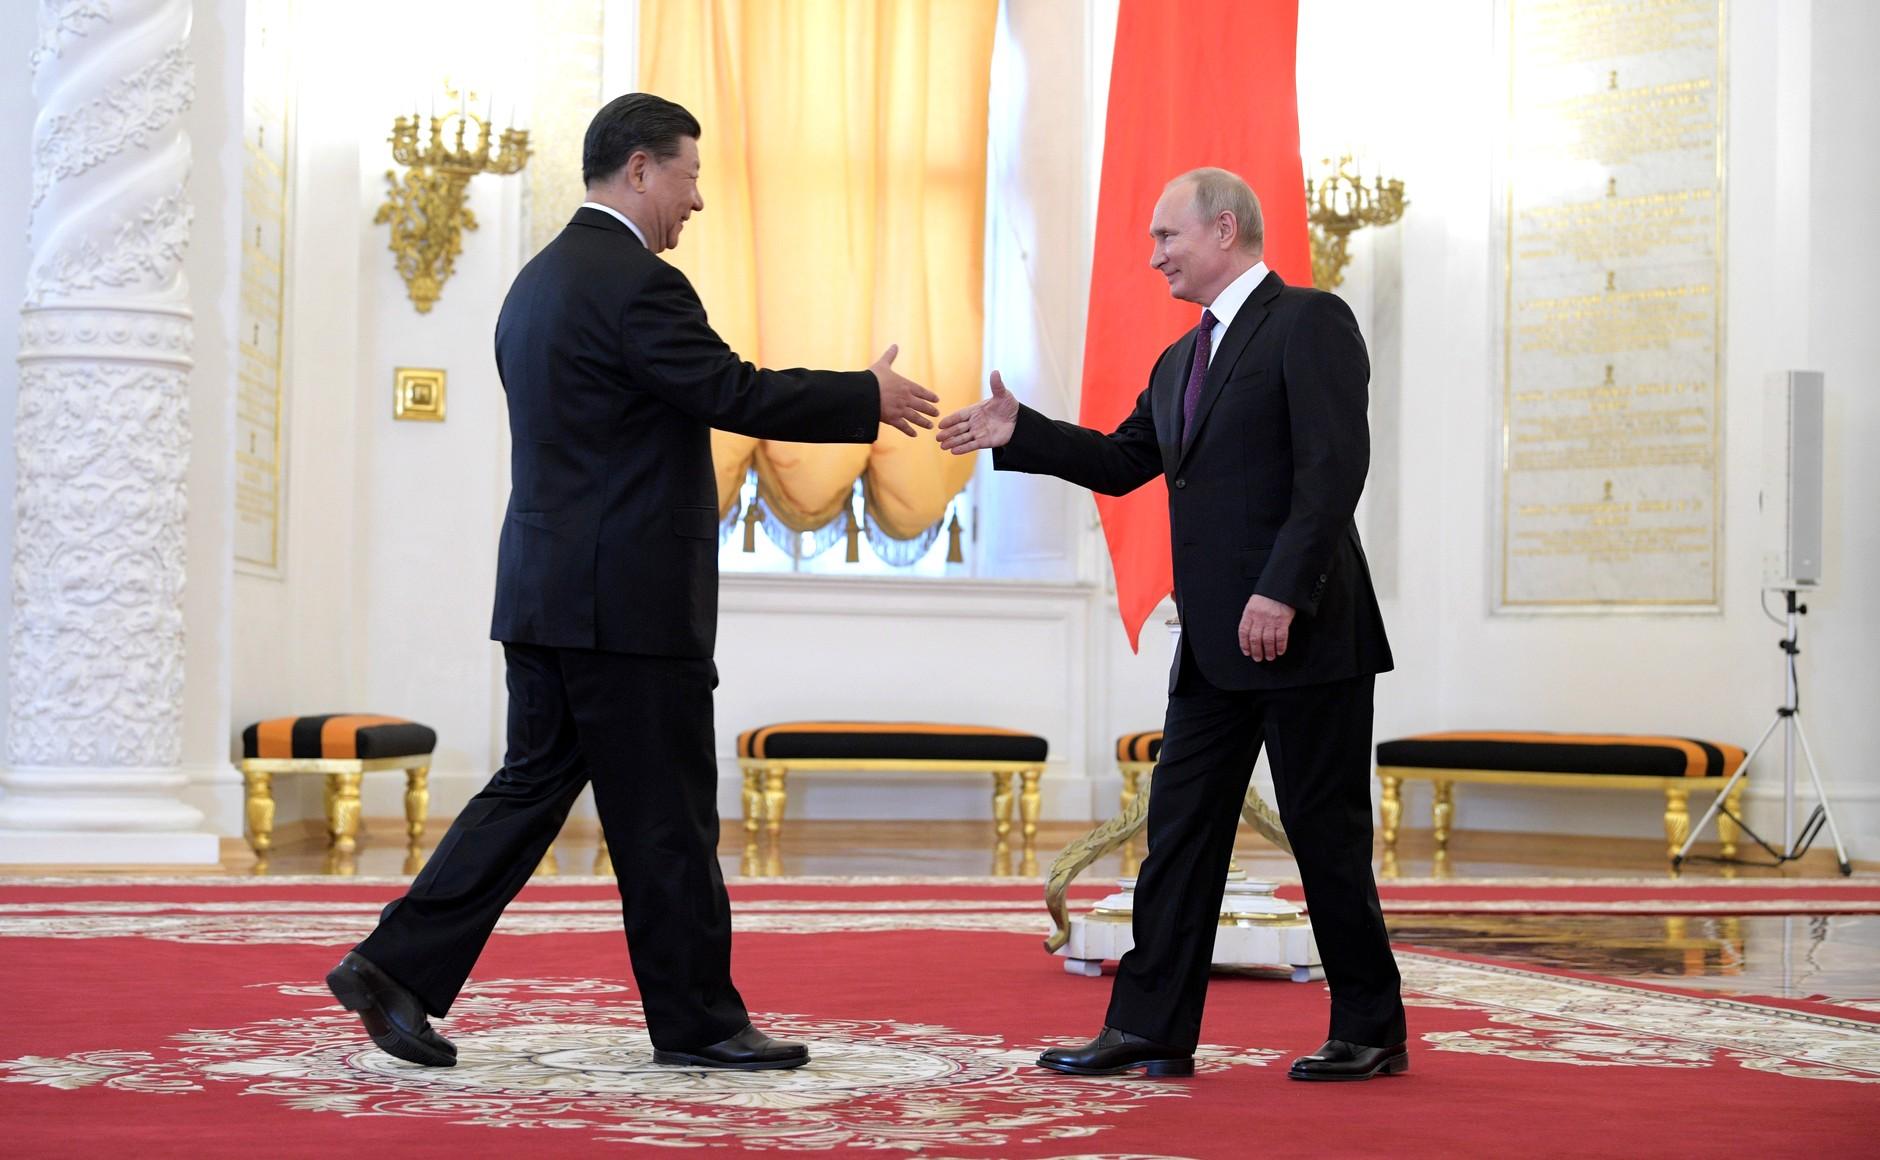 File:Vladimir Putin and Xi Jinping (2019-06-05) 02.jpg - Wikimedia Commons